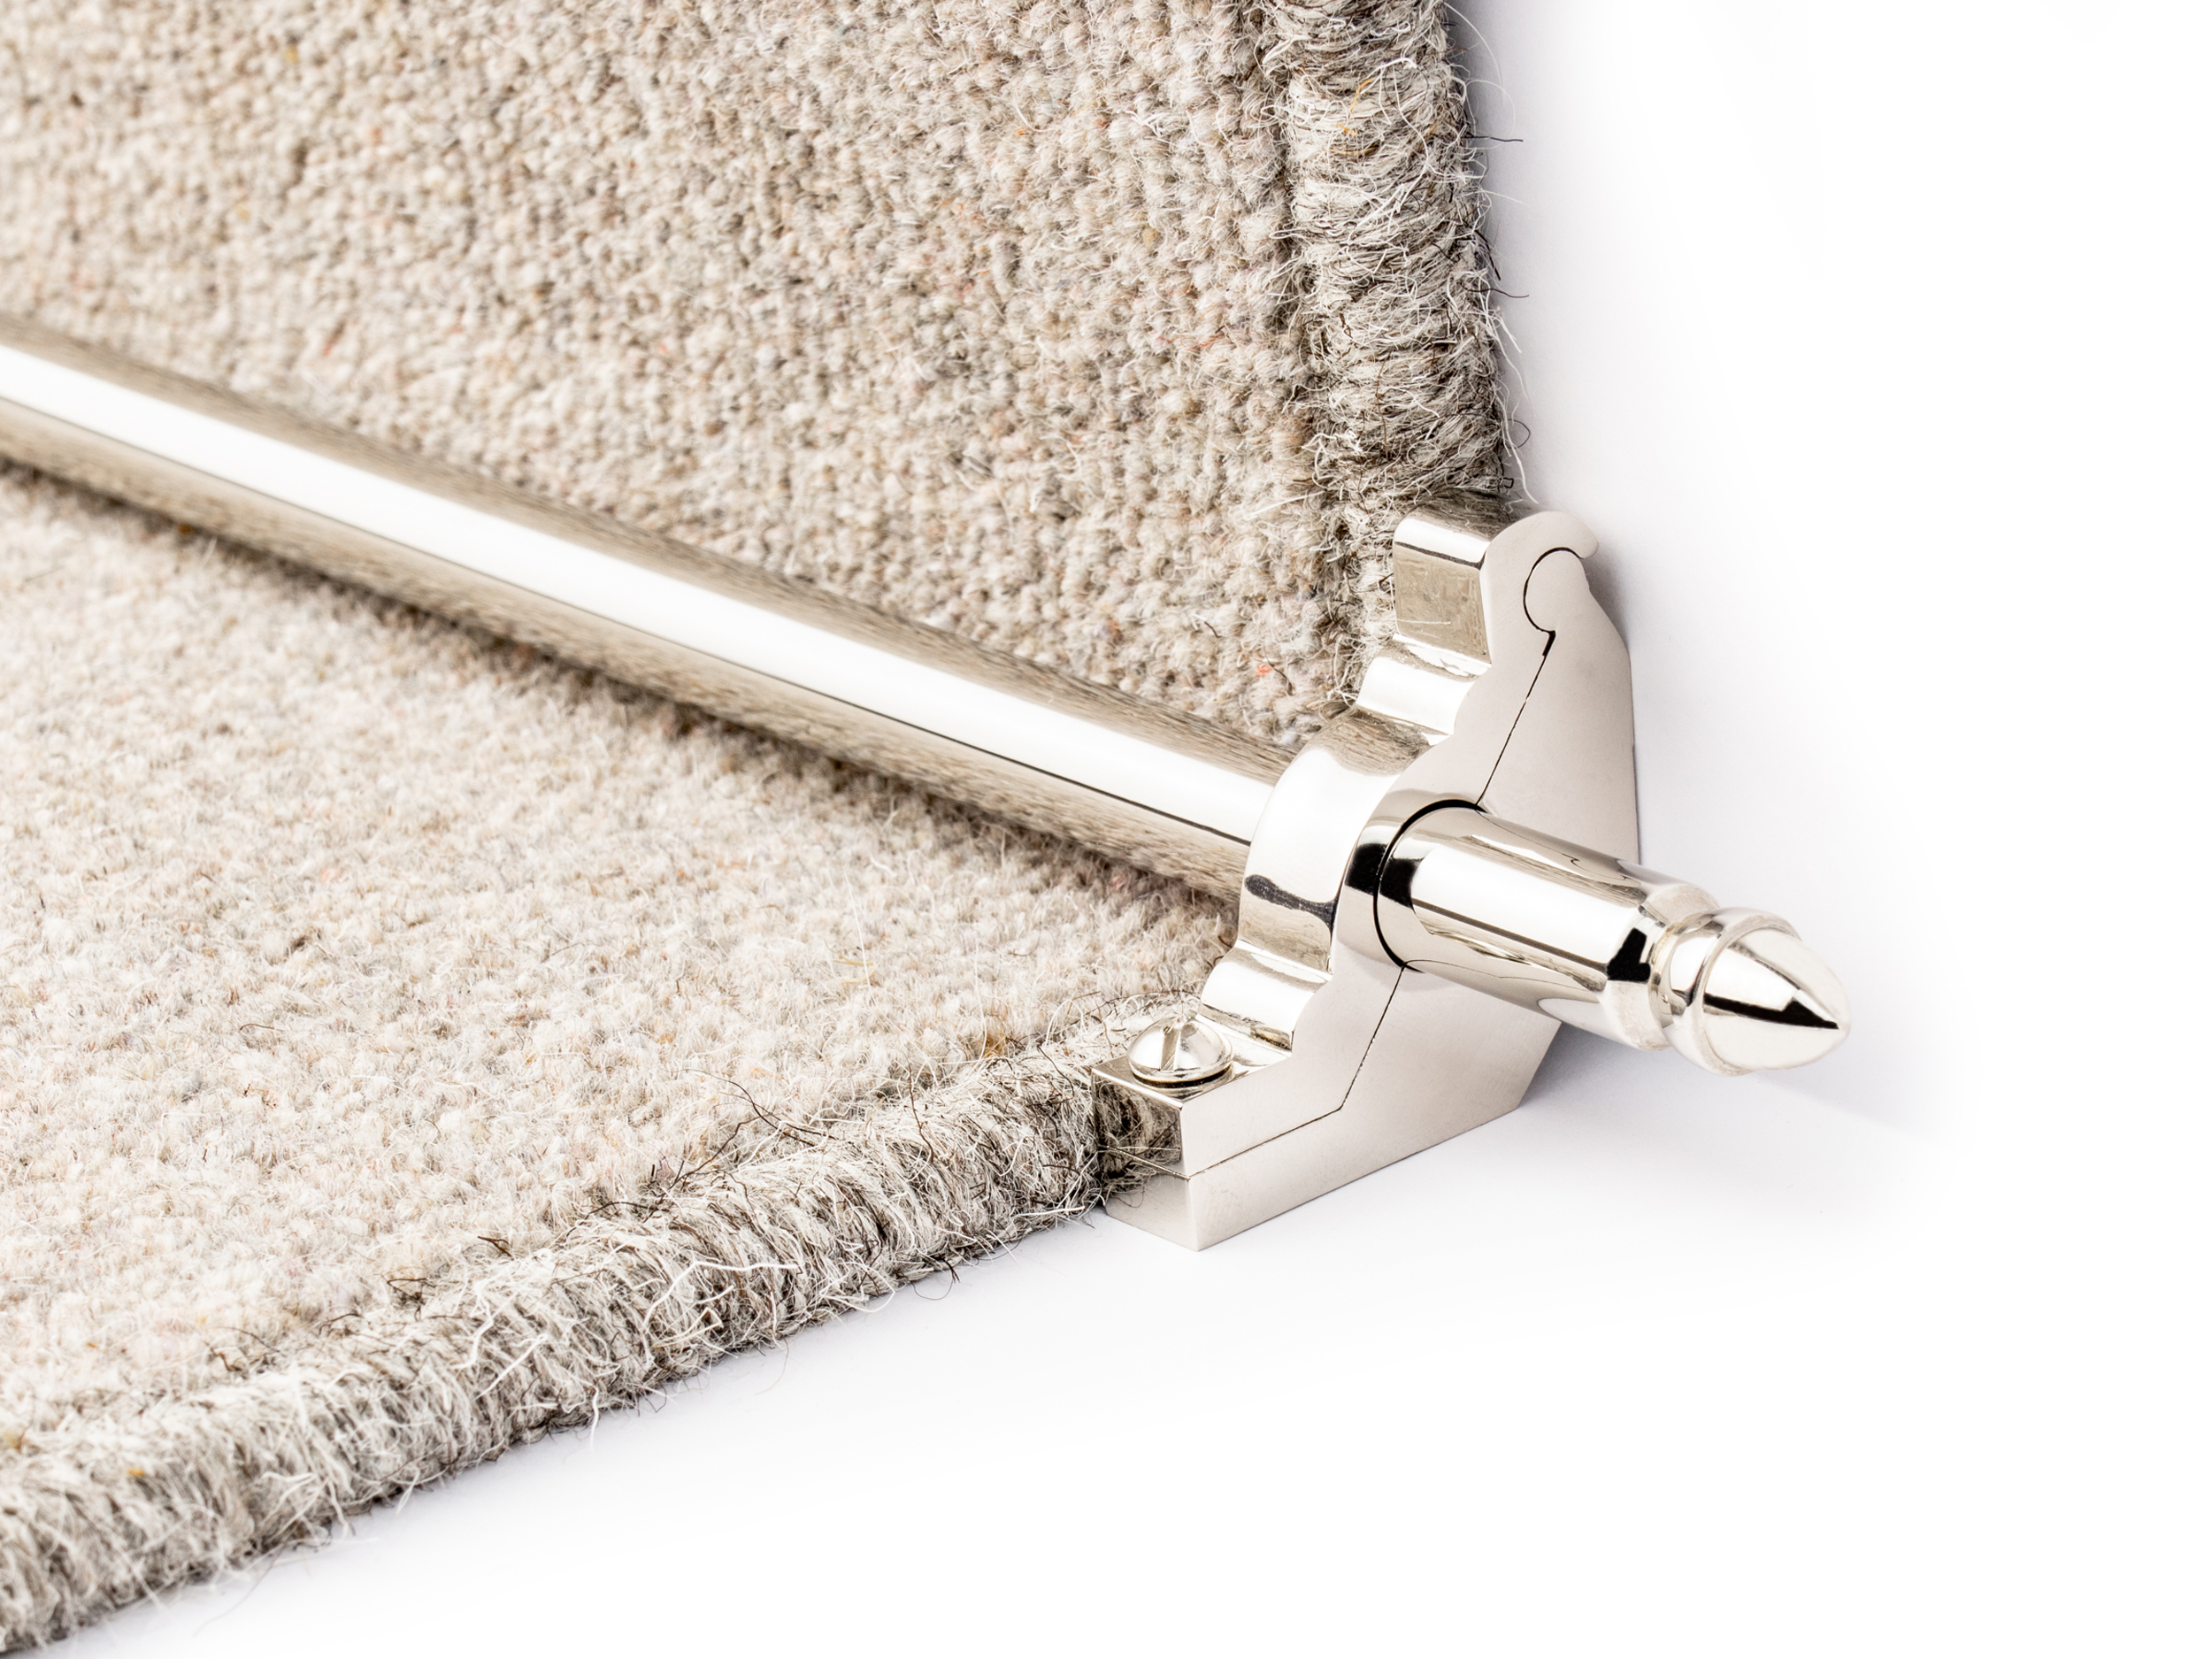 stairrods-polished-nickel-premier-lancaster.jpg